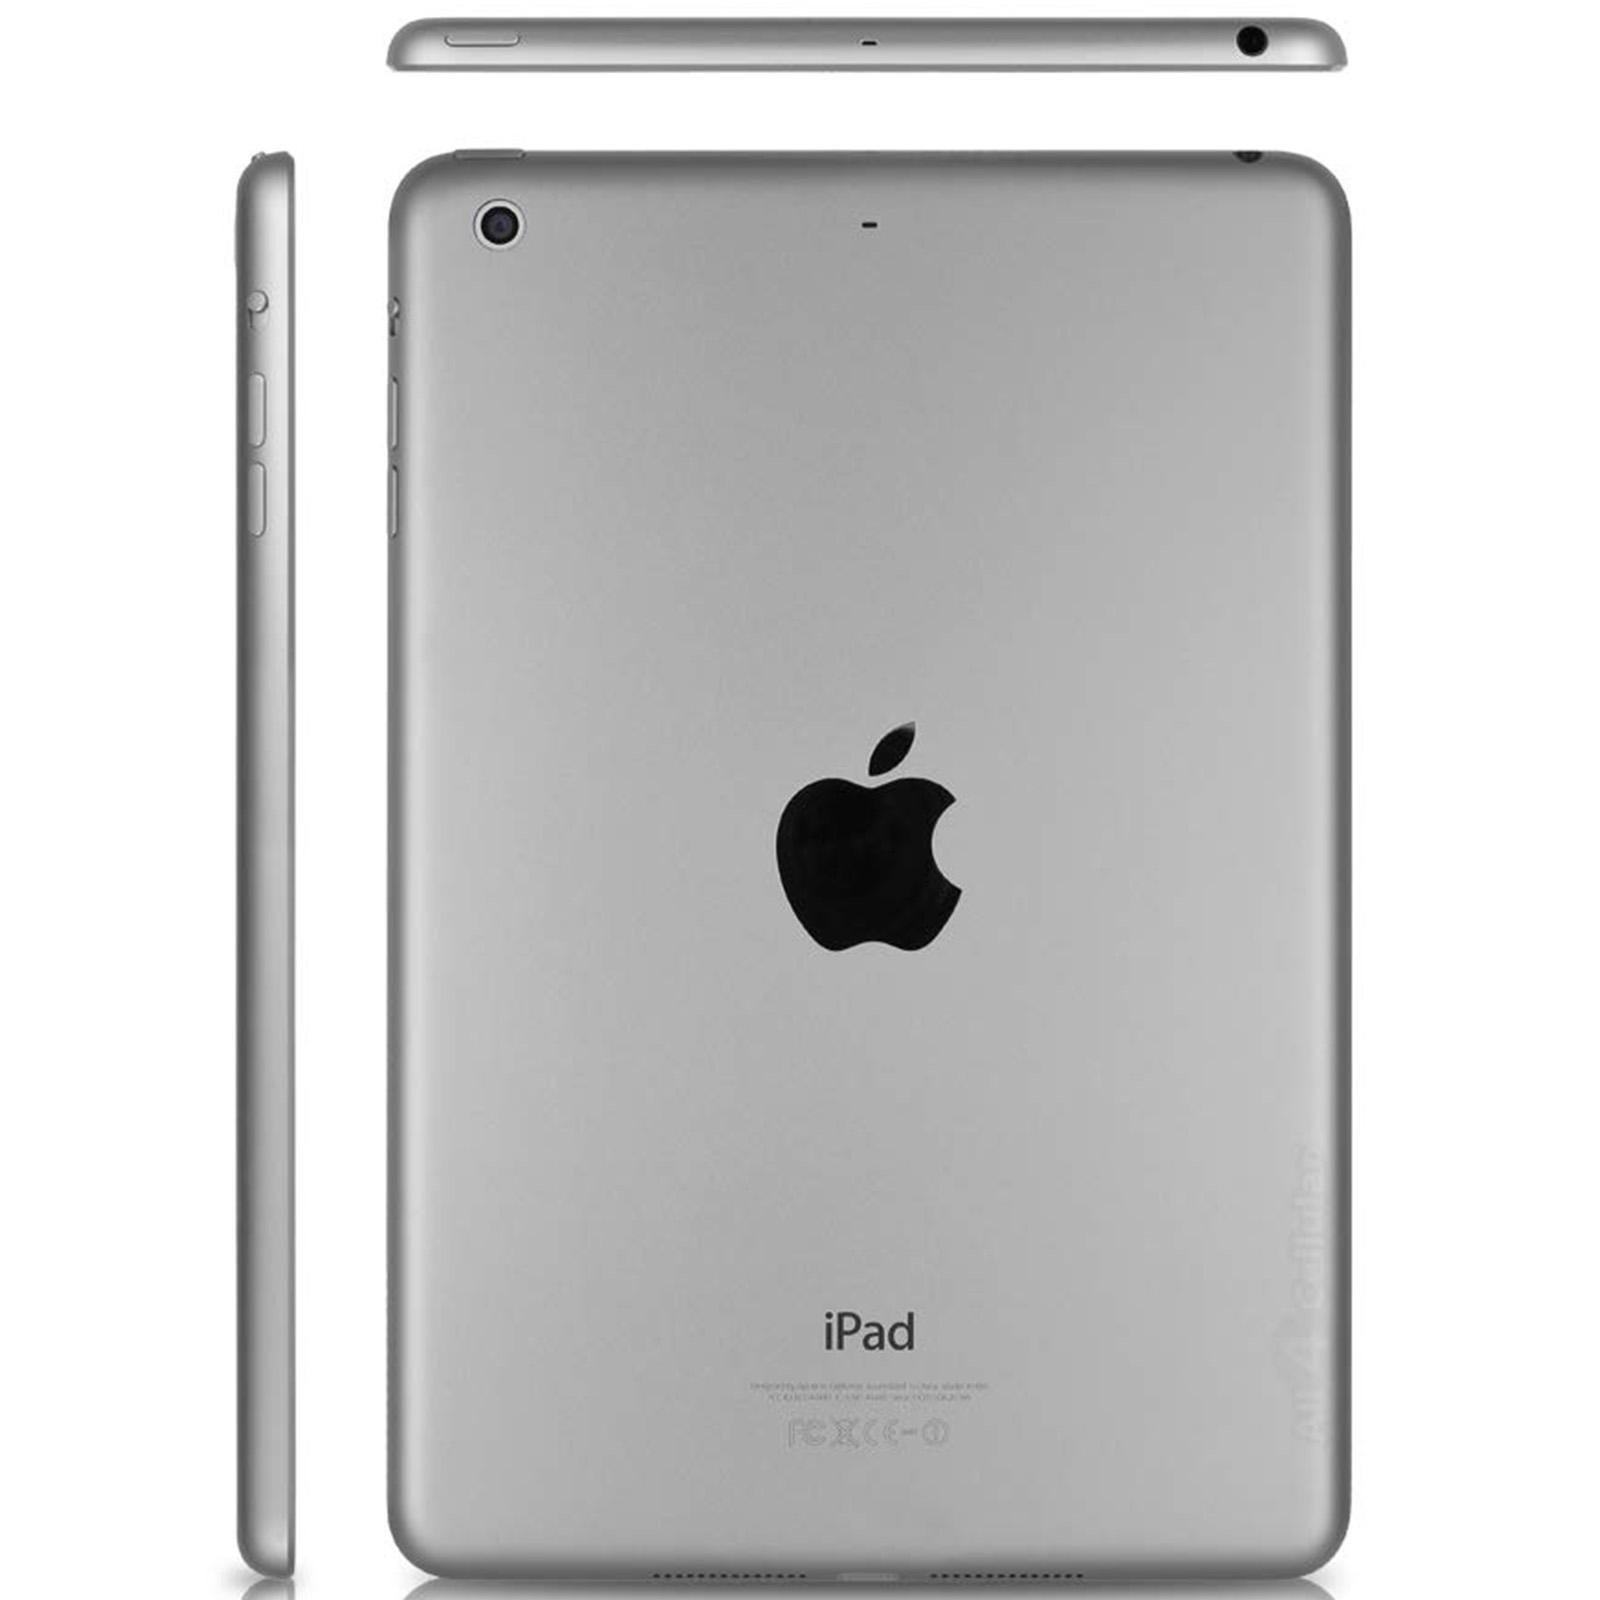 Apple iPad Mini 2 Retina 16GB, Space Gray, Wi-Fi Only/Bundle(3RD LATEST VERSION)